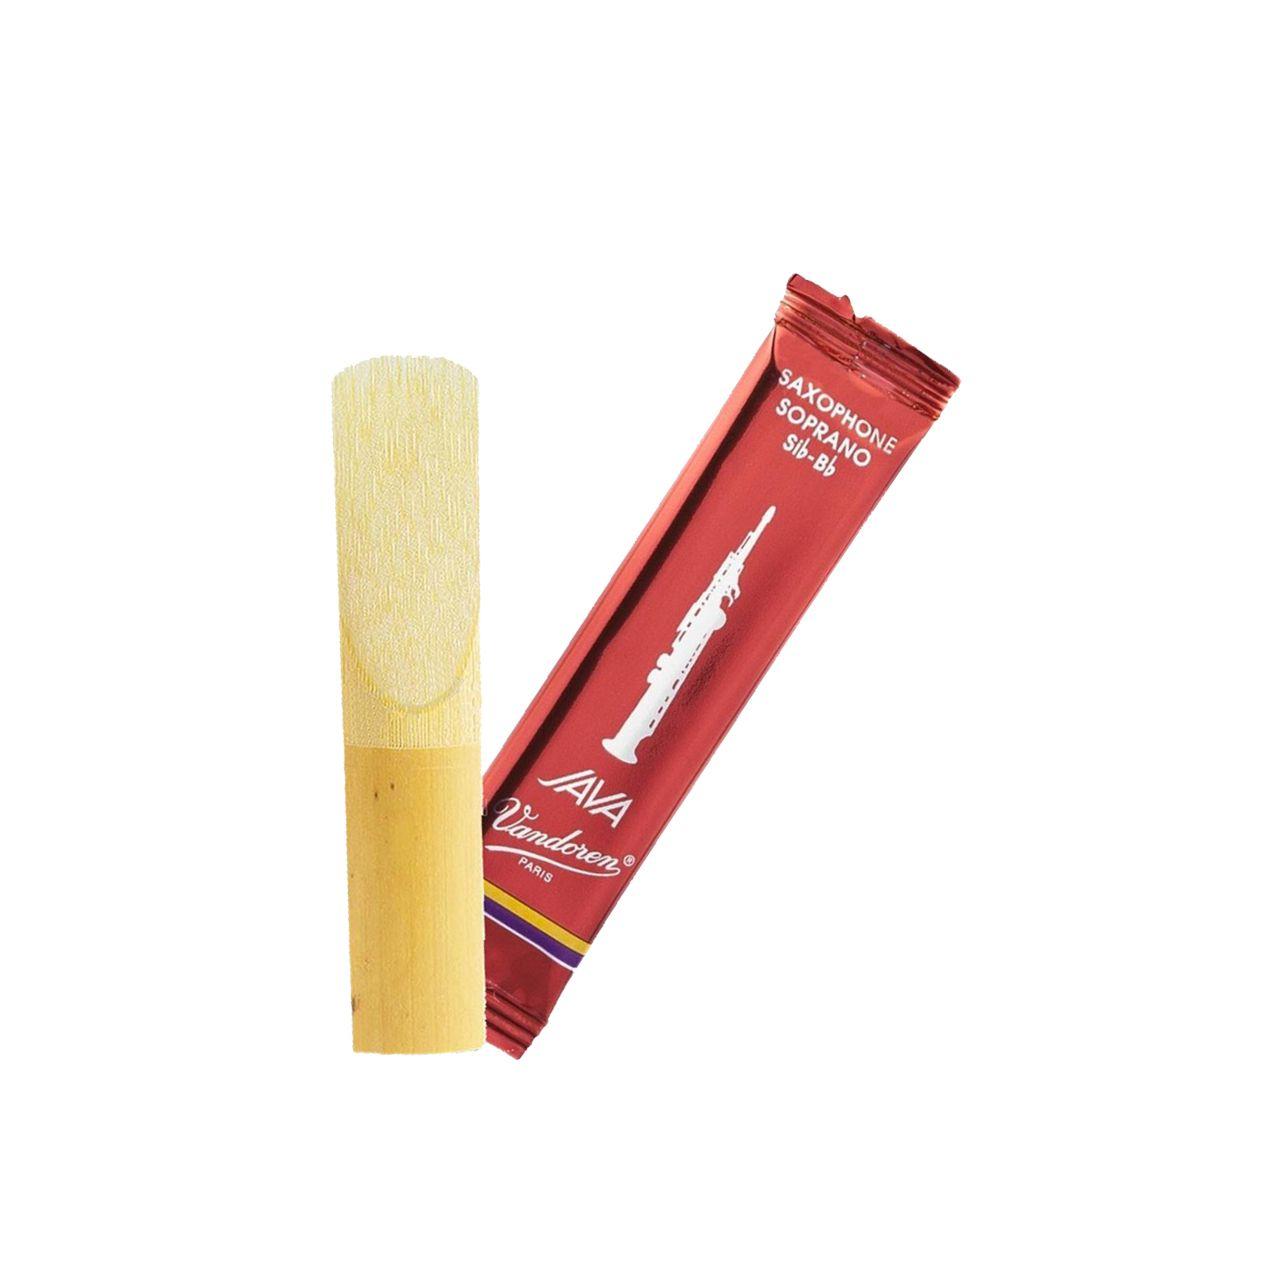 Palheta Java Red Cut 3 P/sax Soprano Cx C/10 Sr303r Vandoren